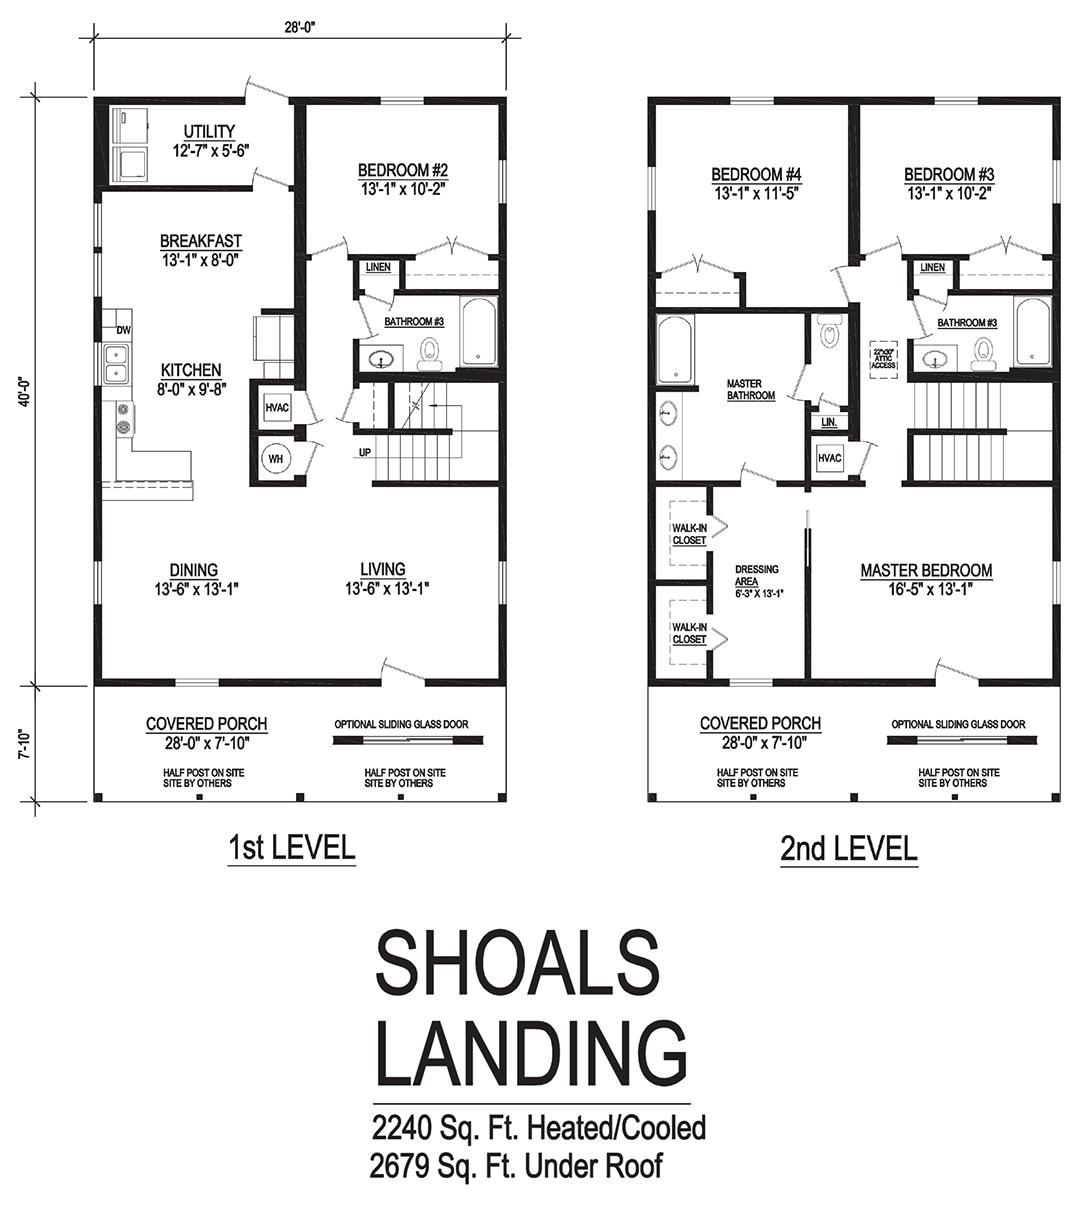 shoals landing modular home floor plan